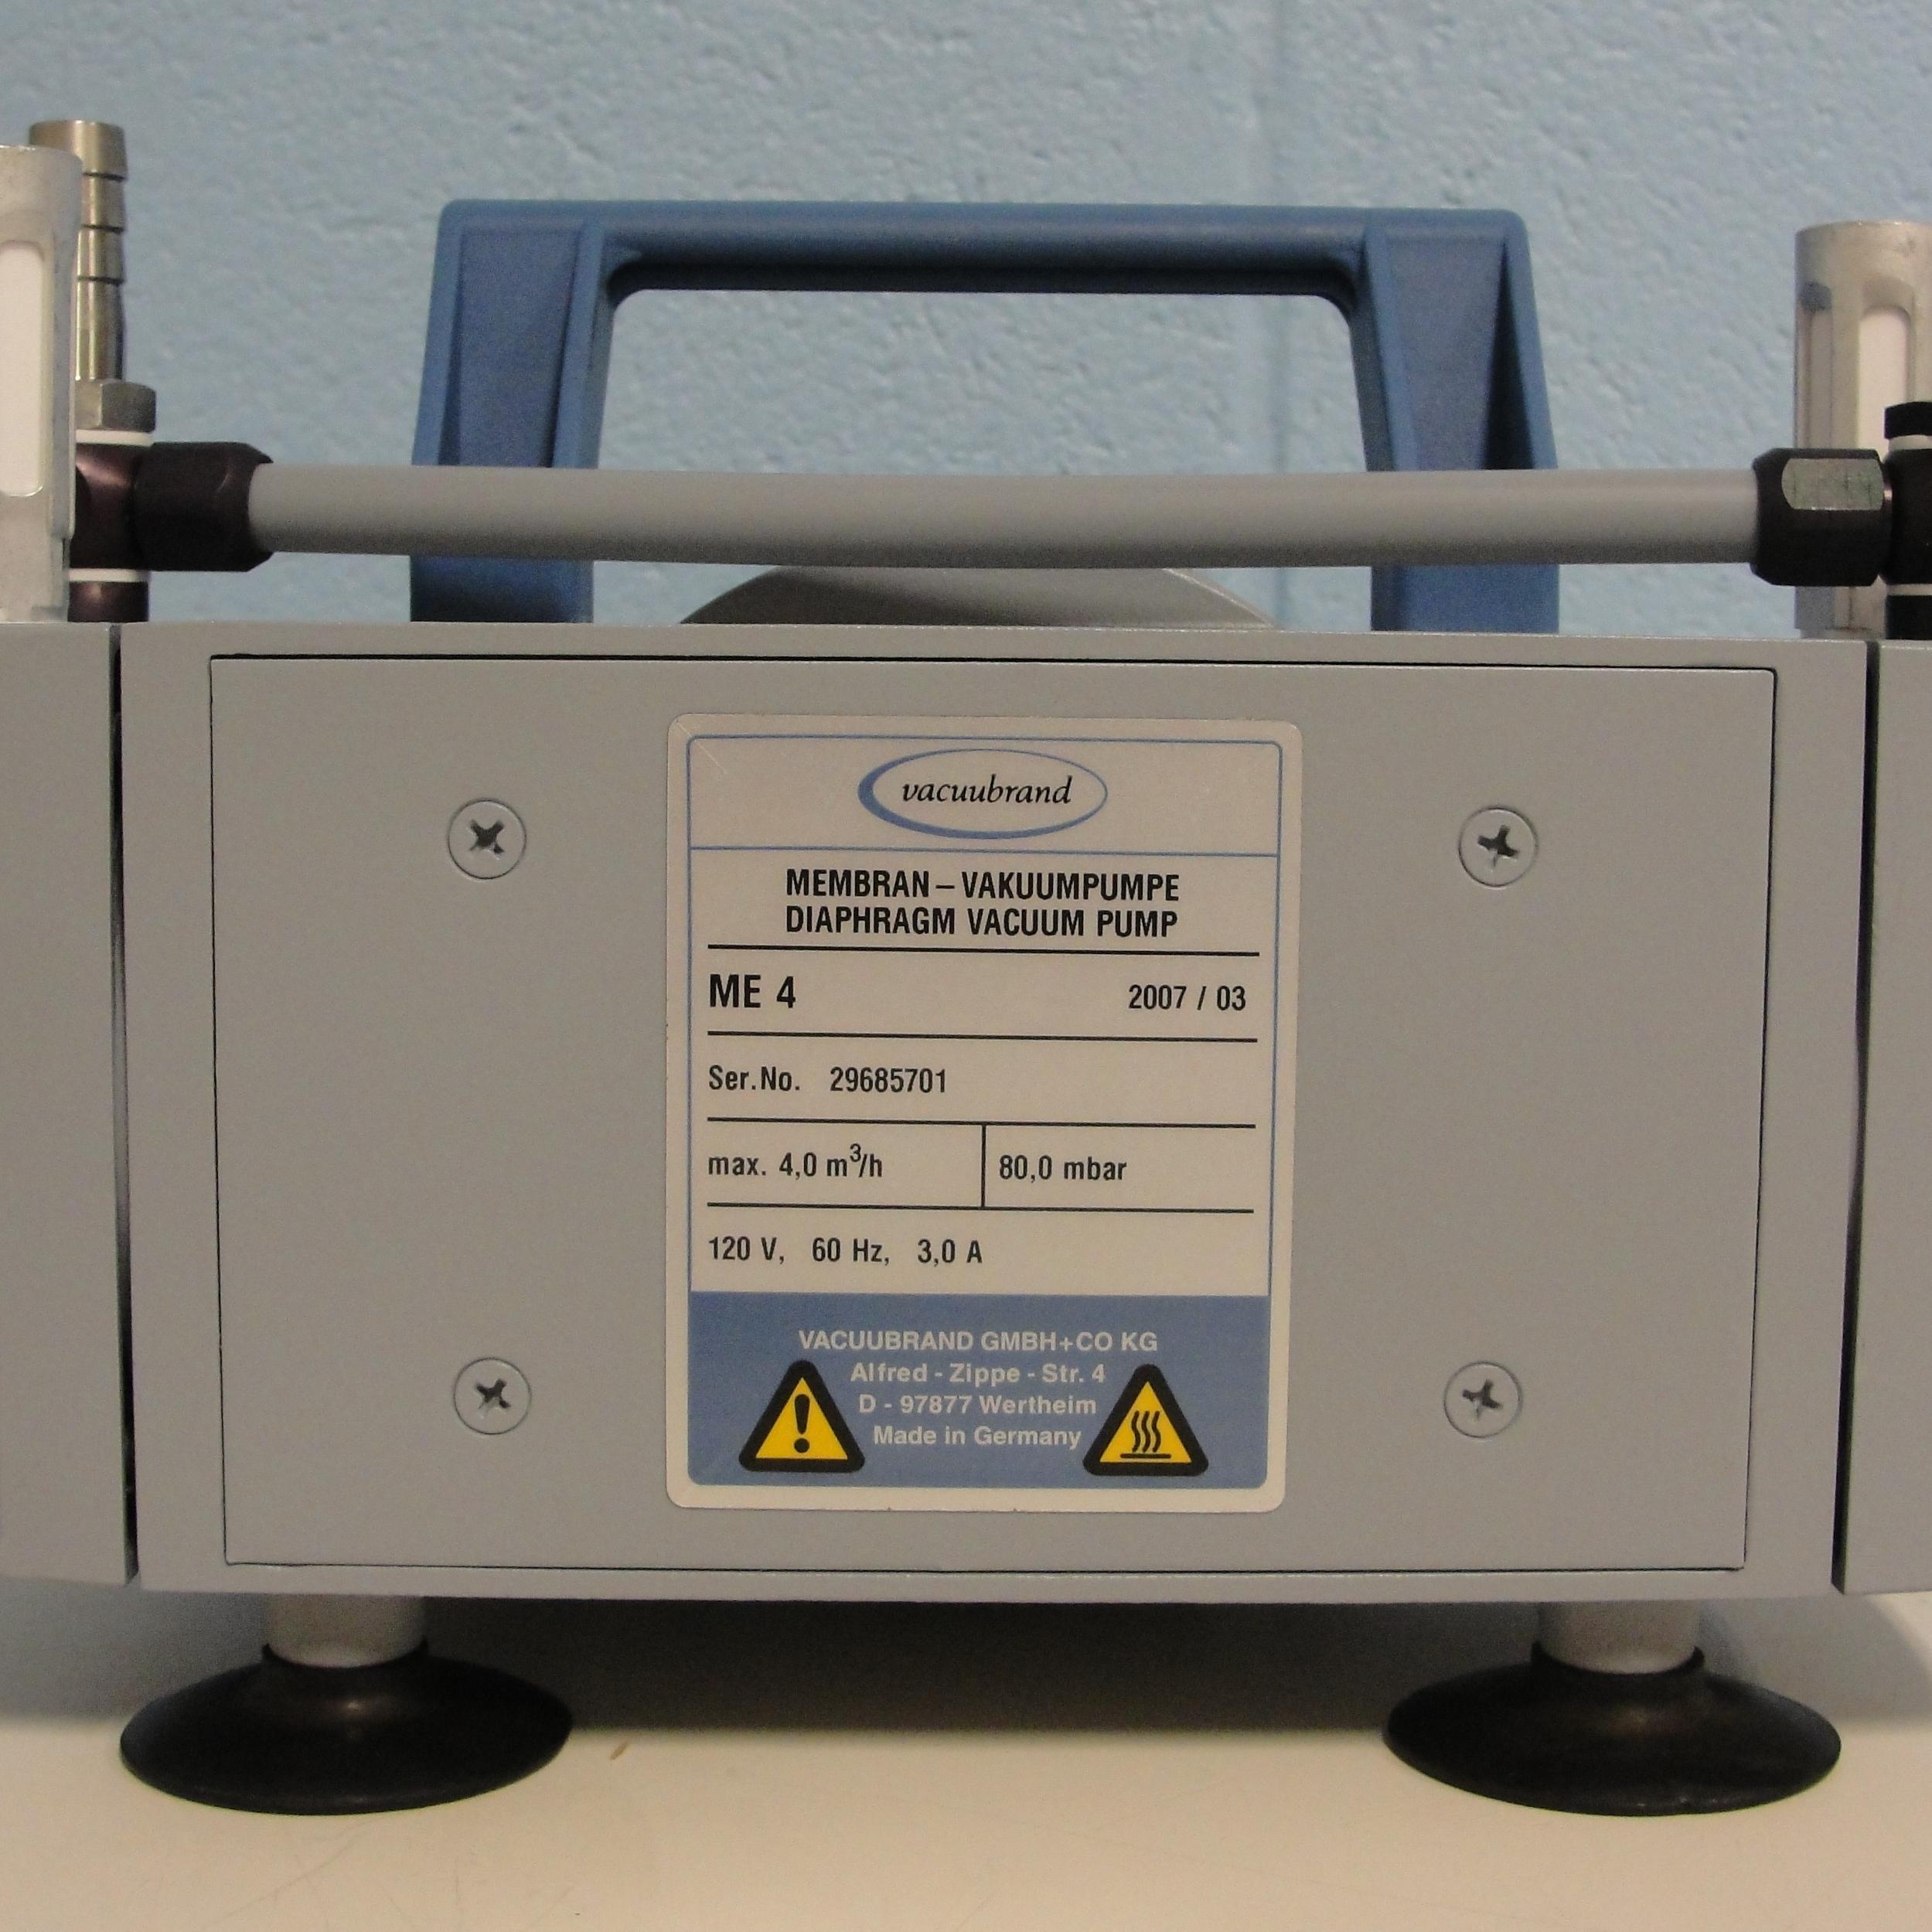 Vacuubrand ME 4 Oil-Free Diaphragm Pump Image